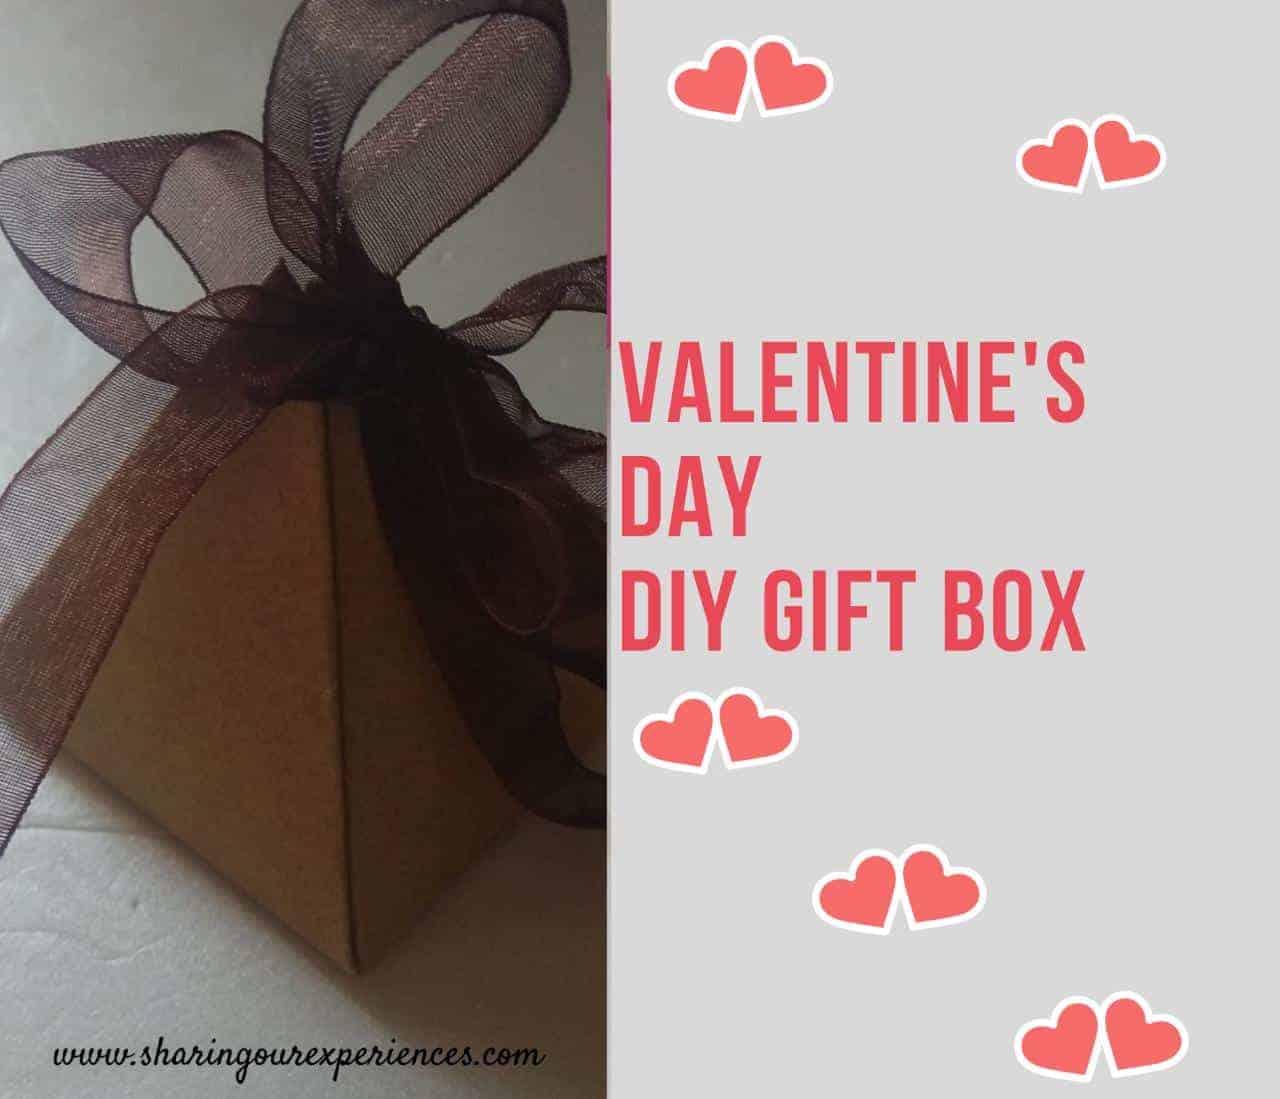 Valentines Day DIY gift box